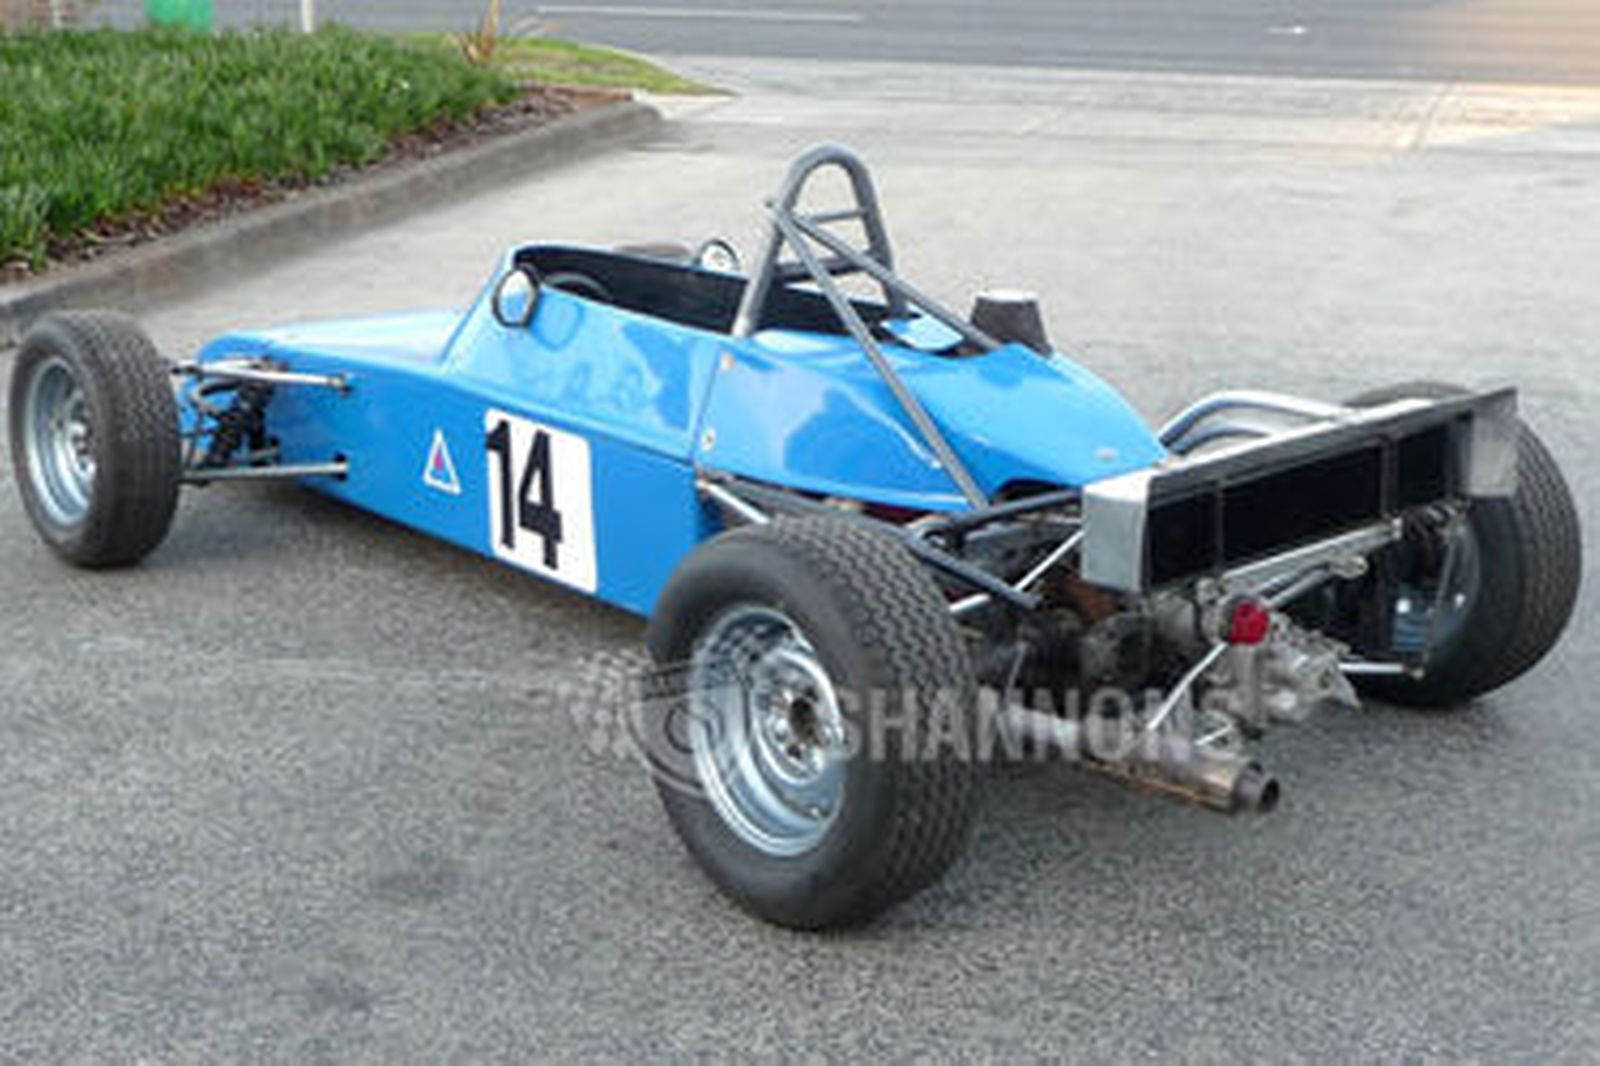 elfin 620b 39 formula ford 39 open wheel race car auctions lot 30 shannons. Black Bedroom Furniture Sets. Home Design Ideas